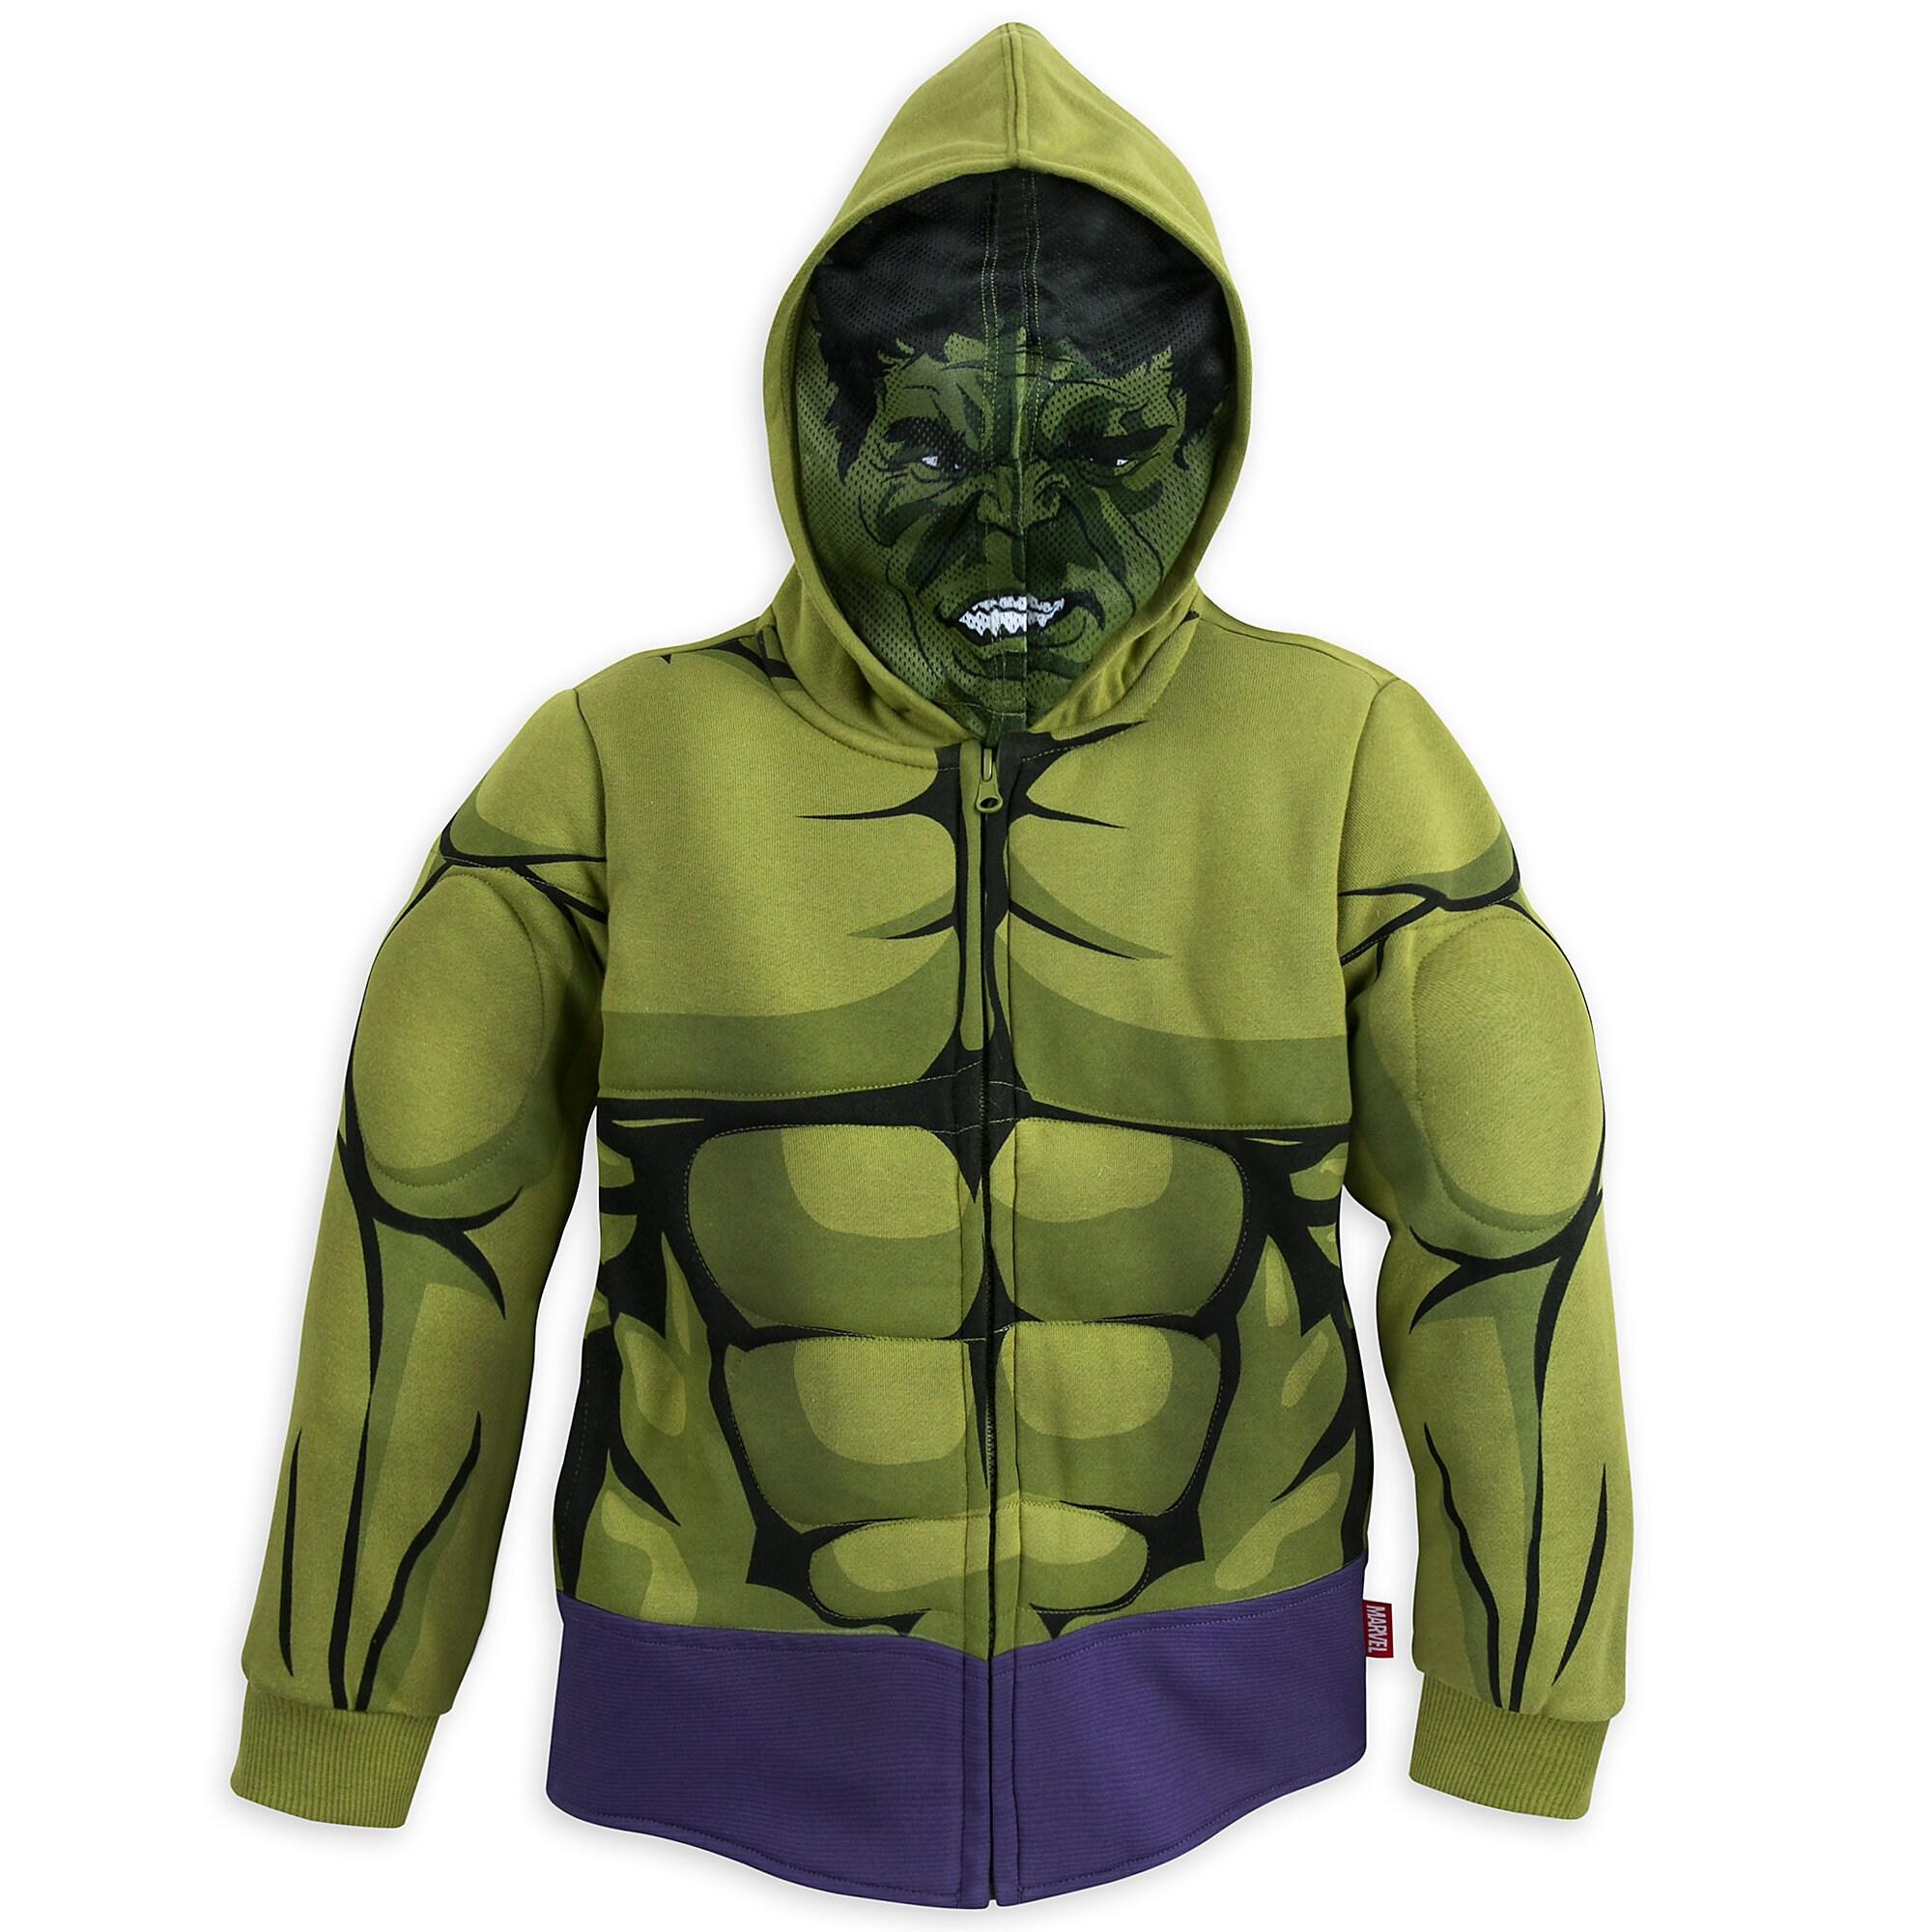 Hulk Costume Hoodie for Boys  sc 1 st  shopDisney & Hulk Costume Hoodie for Boys | shopDisney